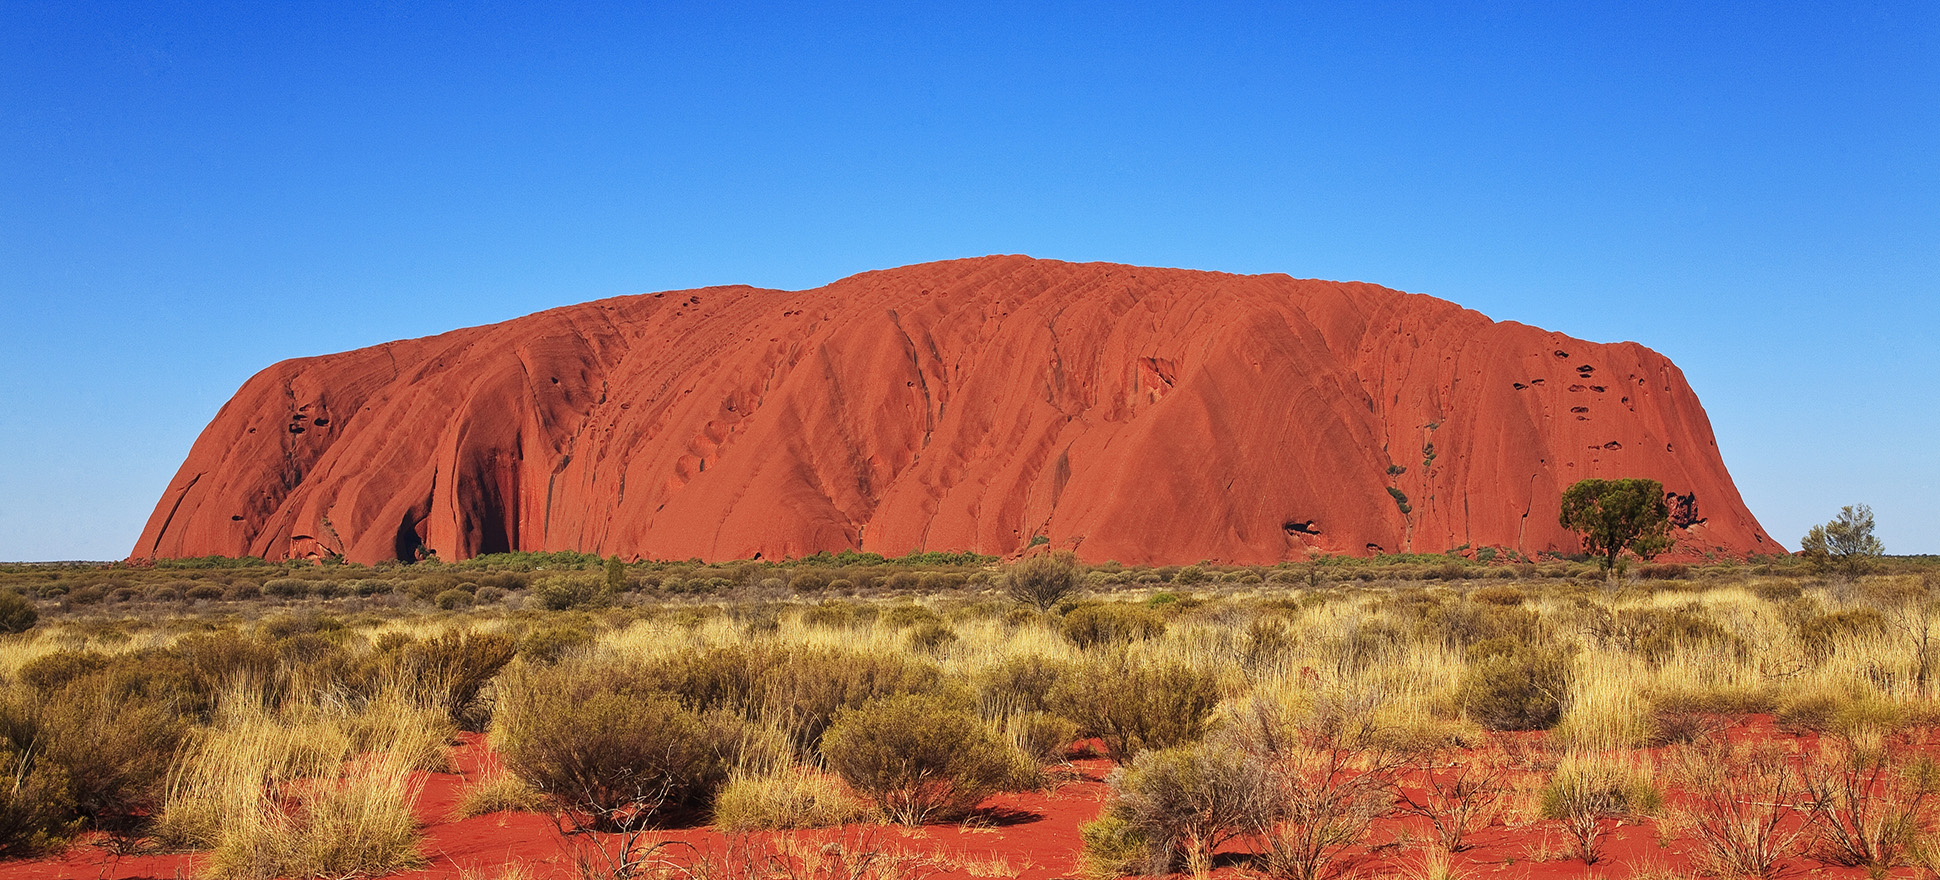 uluru | red rock | australia | Tours to Australia – the Land of Wonders